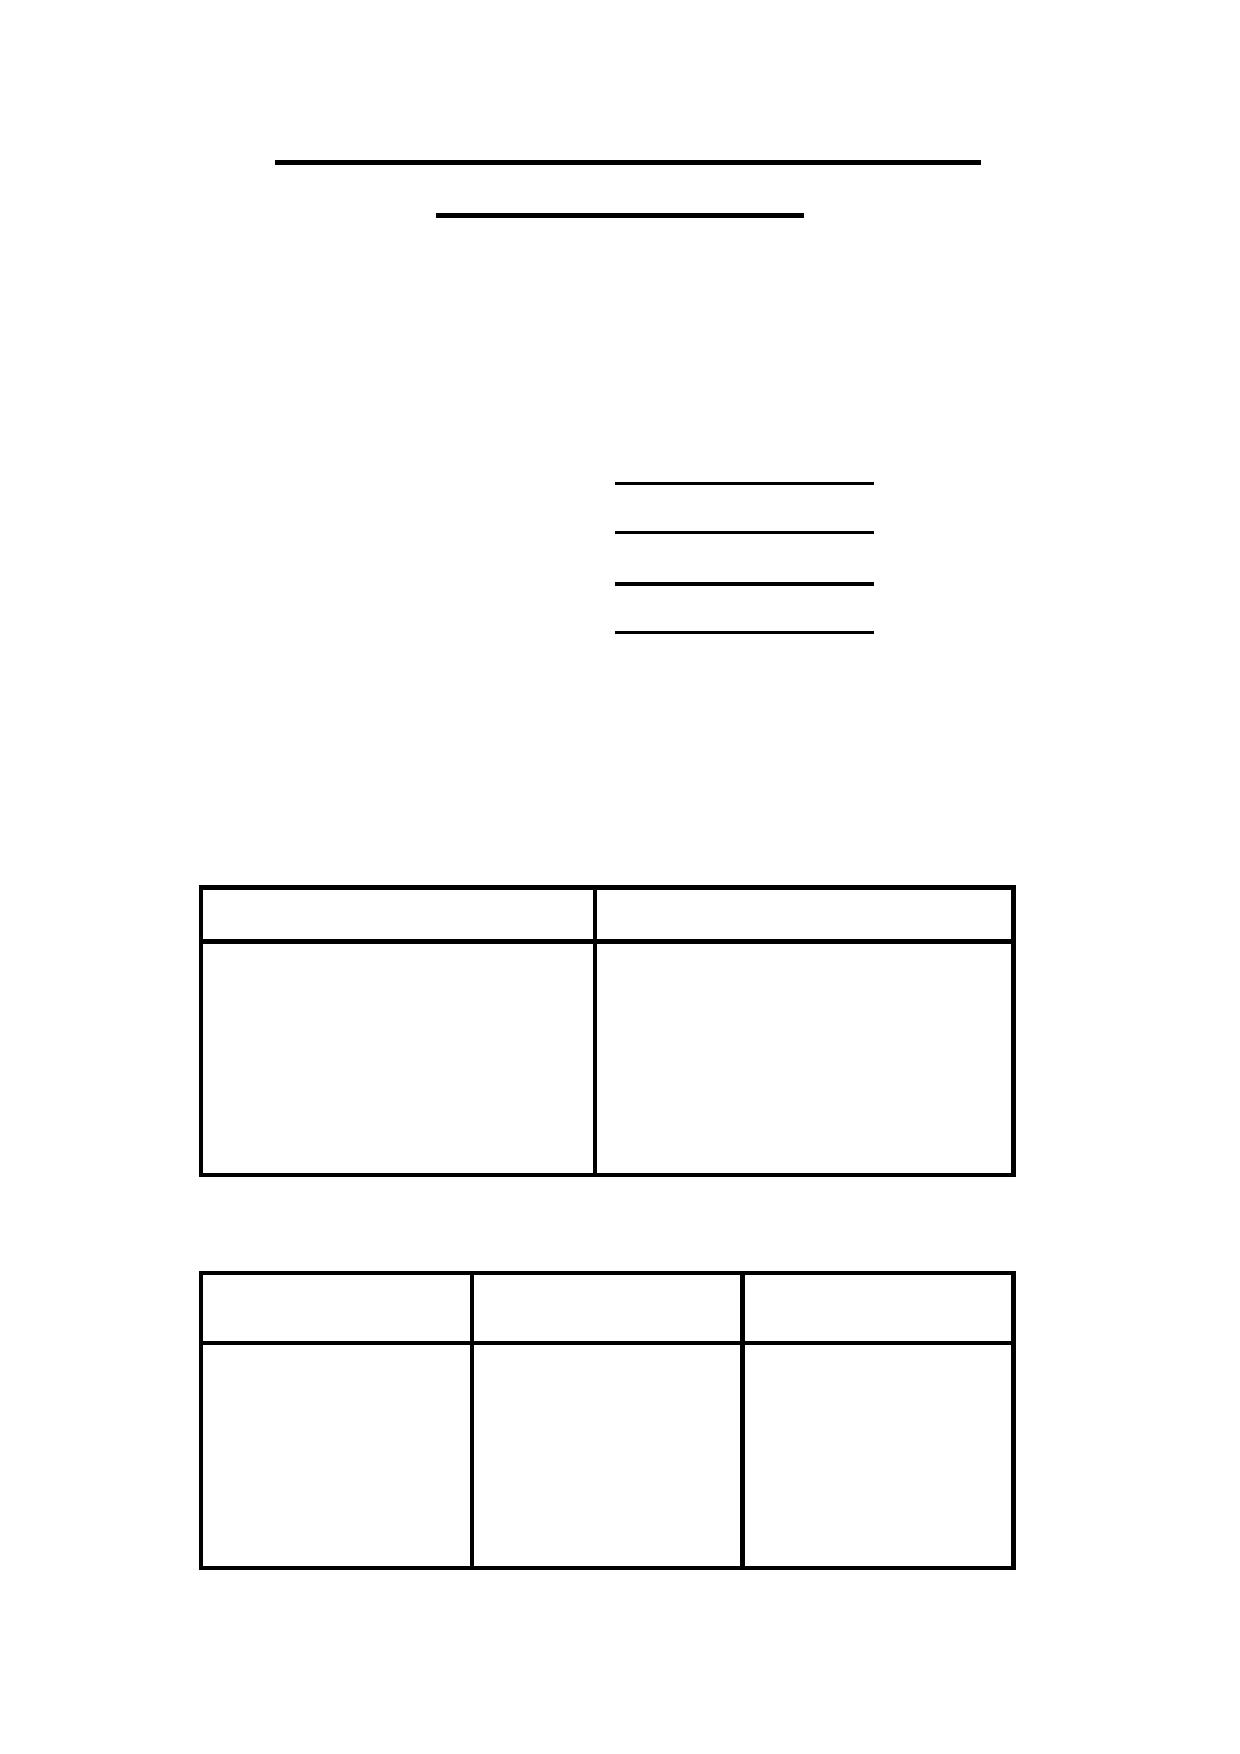 Q101IRE-LA1 datasheet